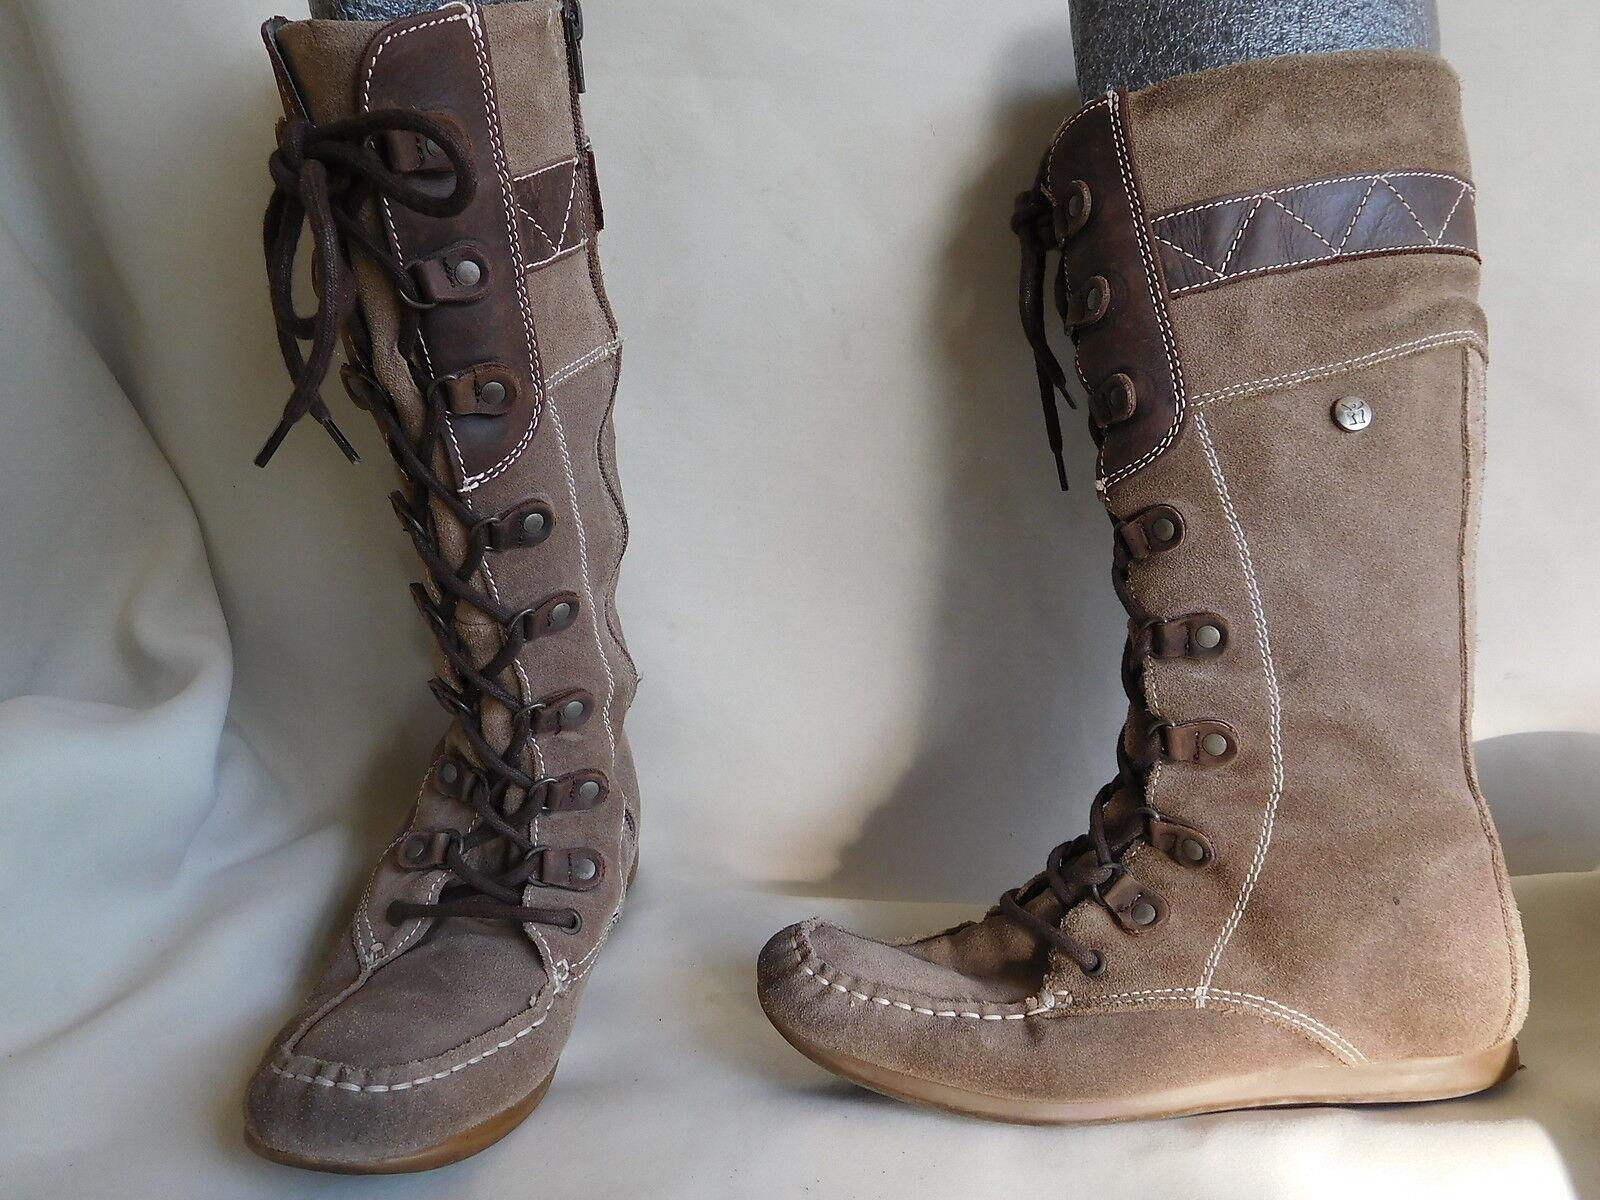 MAG CHAUSSURE BOTTE FEMME FILLE CUIR DAIM BEIGE MARRON pt 38 NAVAJO bottes chaussures